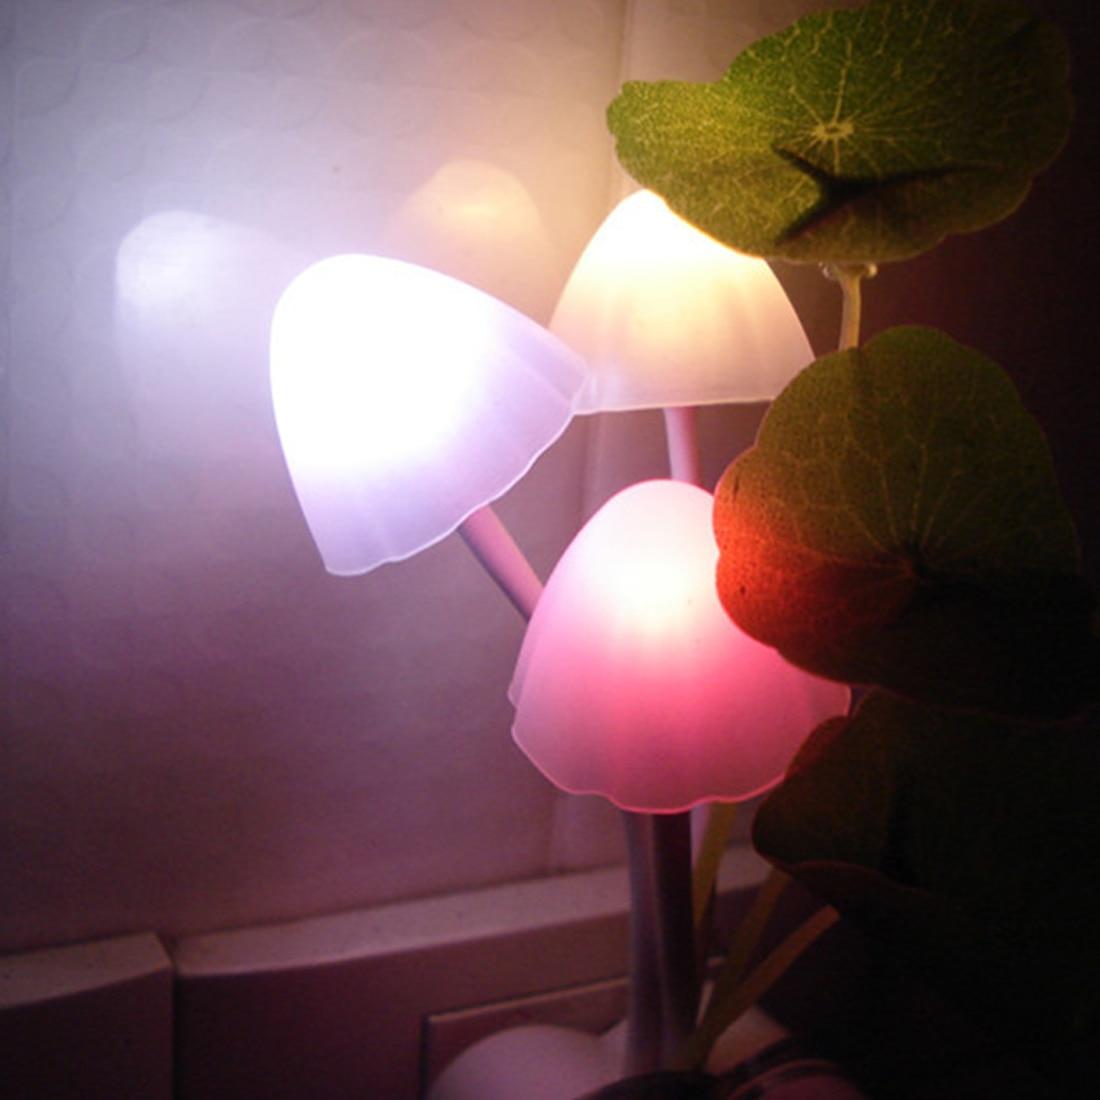 1 stk Nyhed US og EU Plug LED Night Light Induktion Dream Champignon 3 LED Light S Lamp